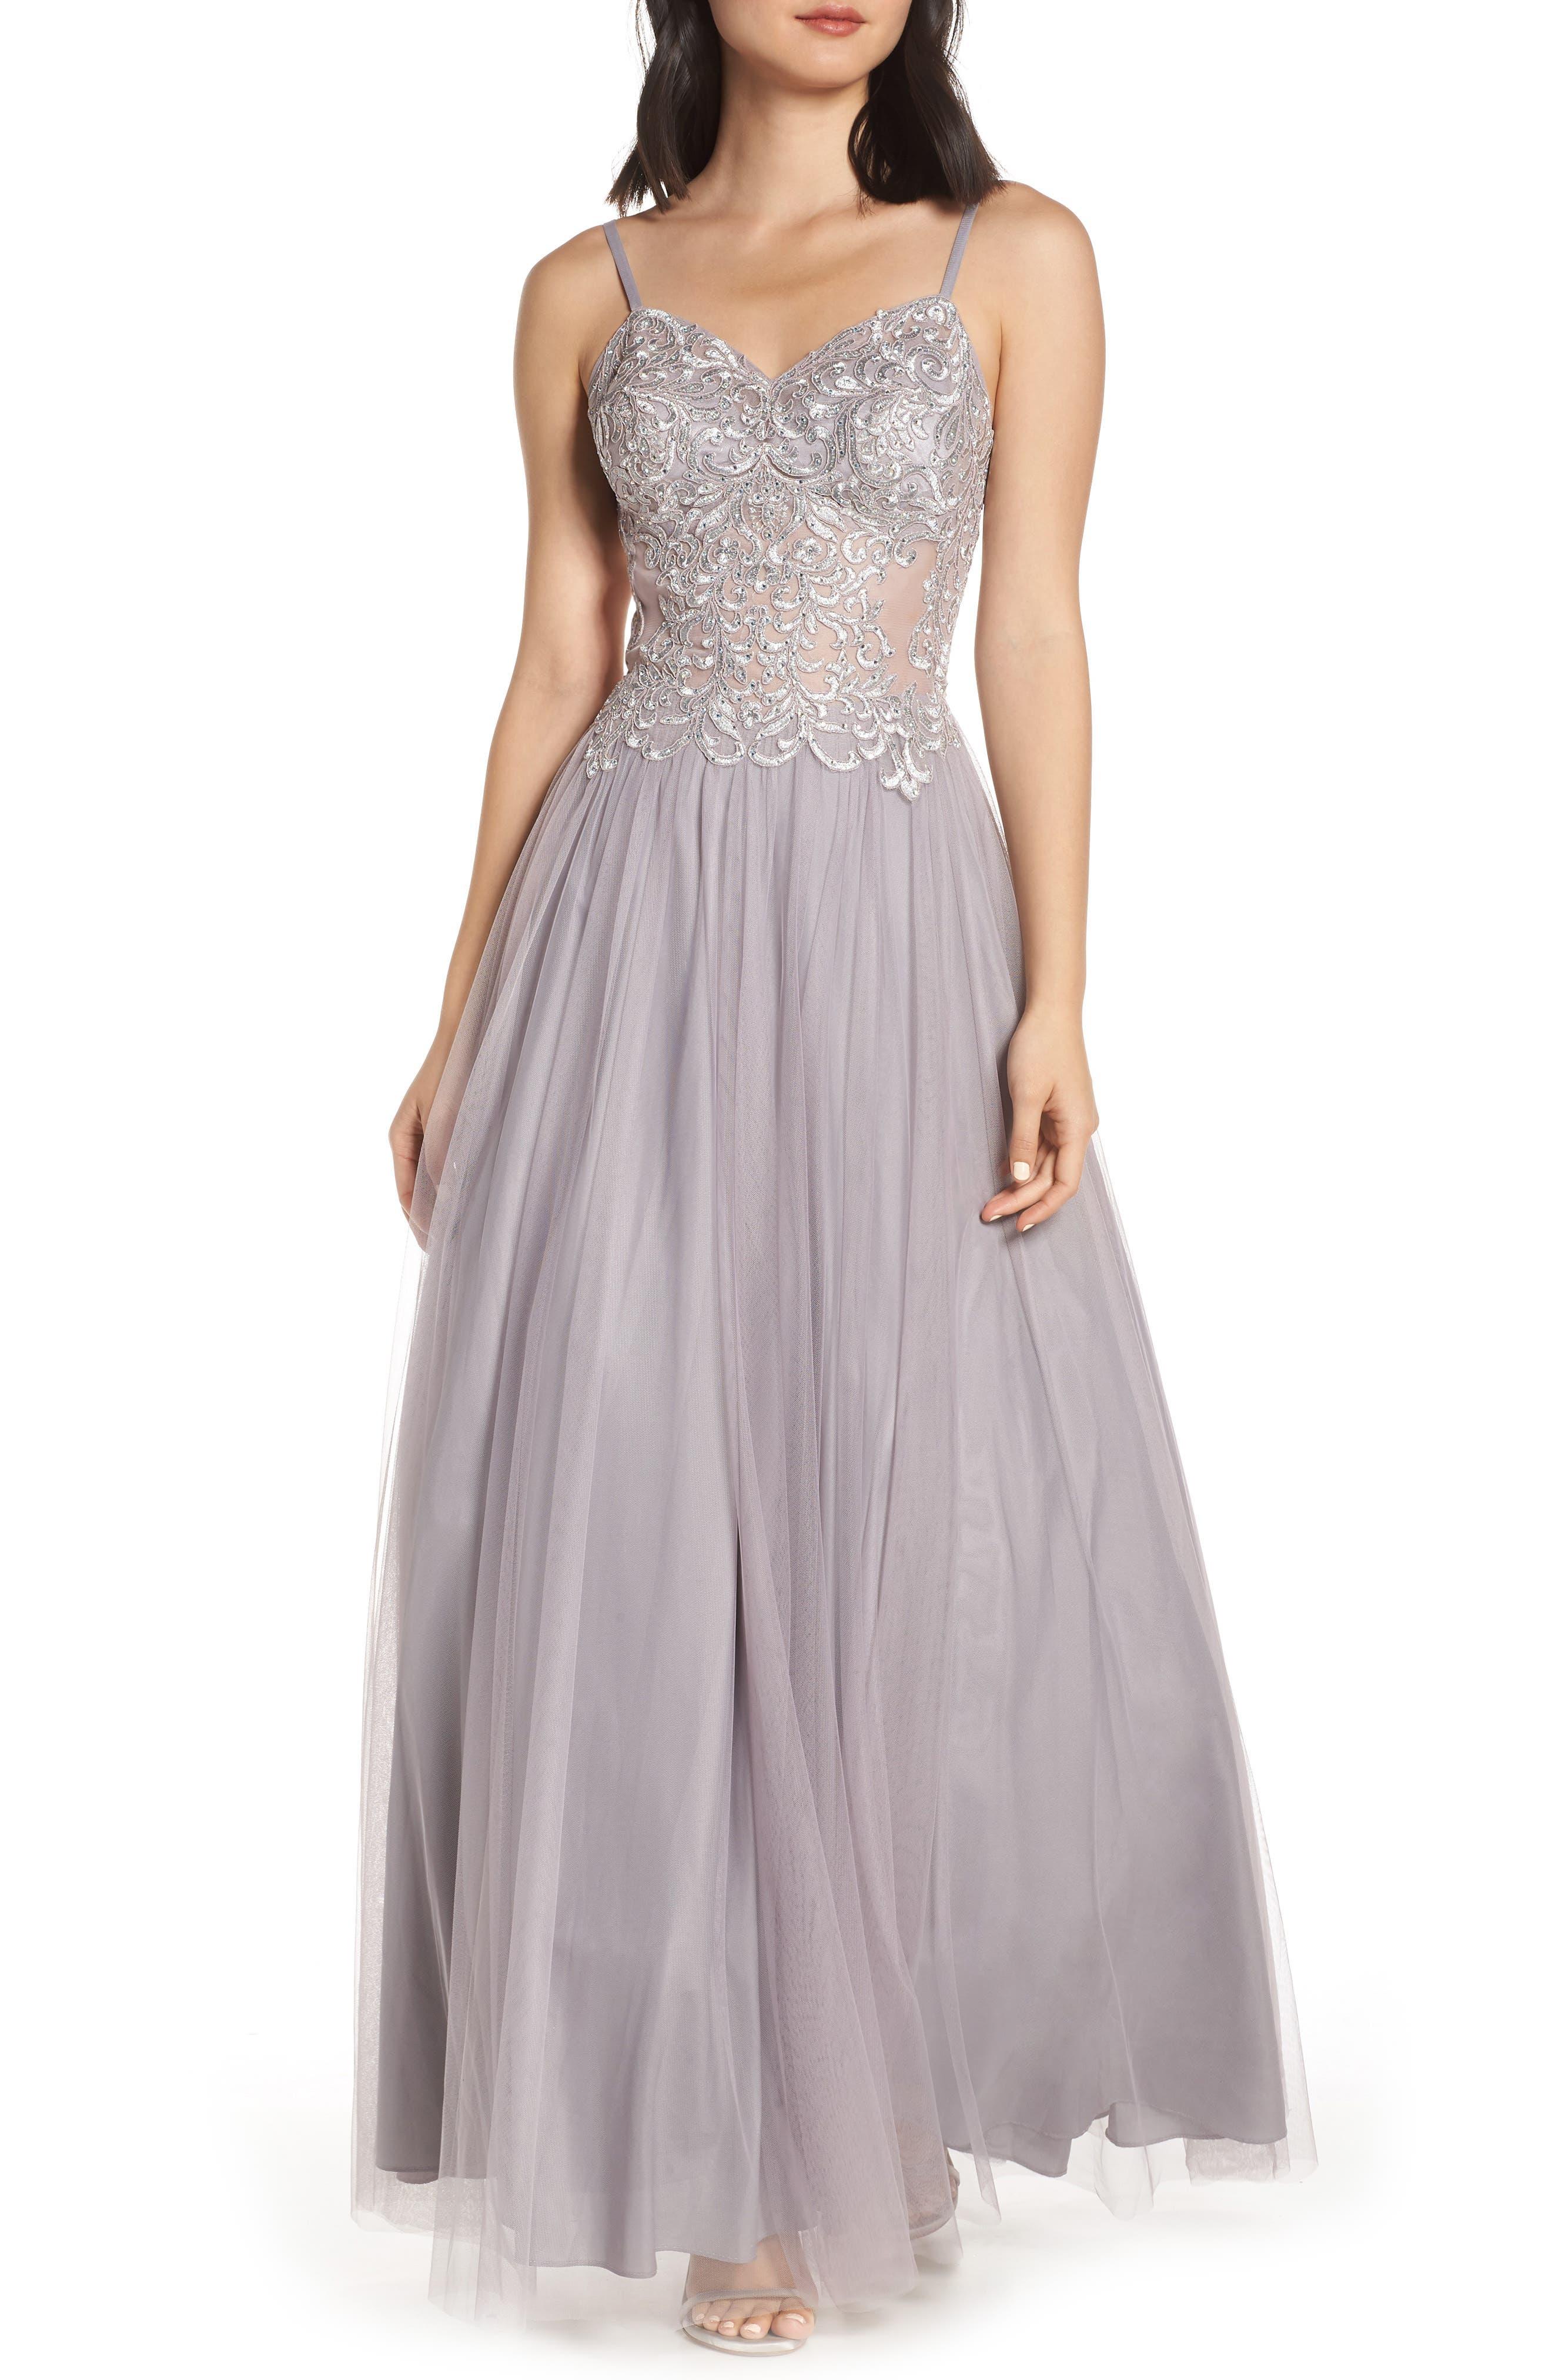 Blondie Nites Applique Illusion Mesh Evening Dress, Purple